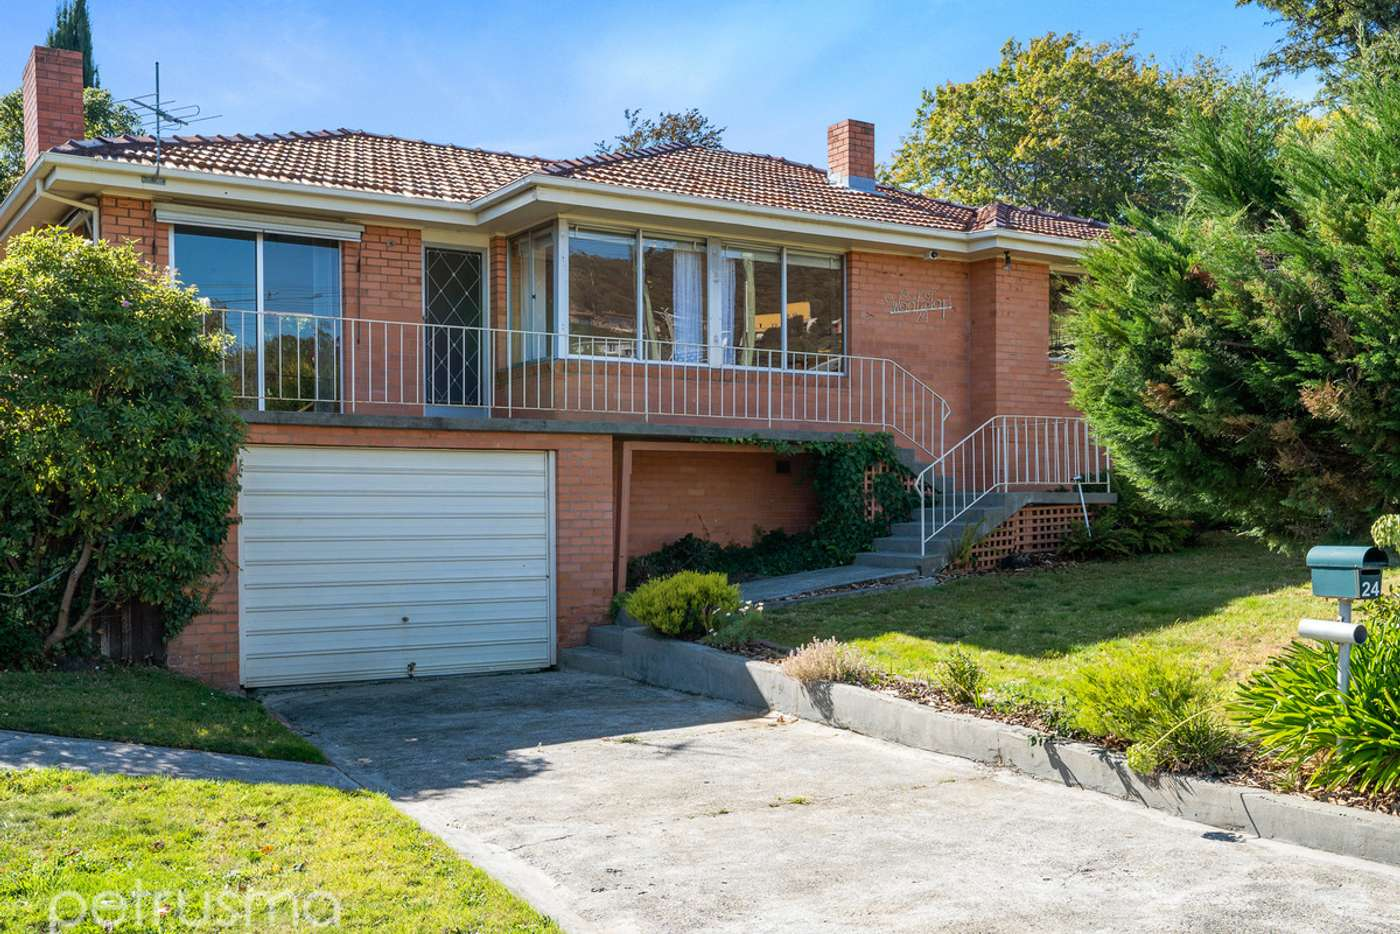 Main view of Homely house listing, 24 Nietta Road, Lindisfarne TAS 7015